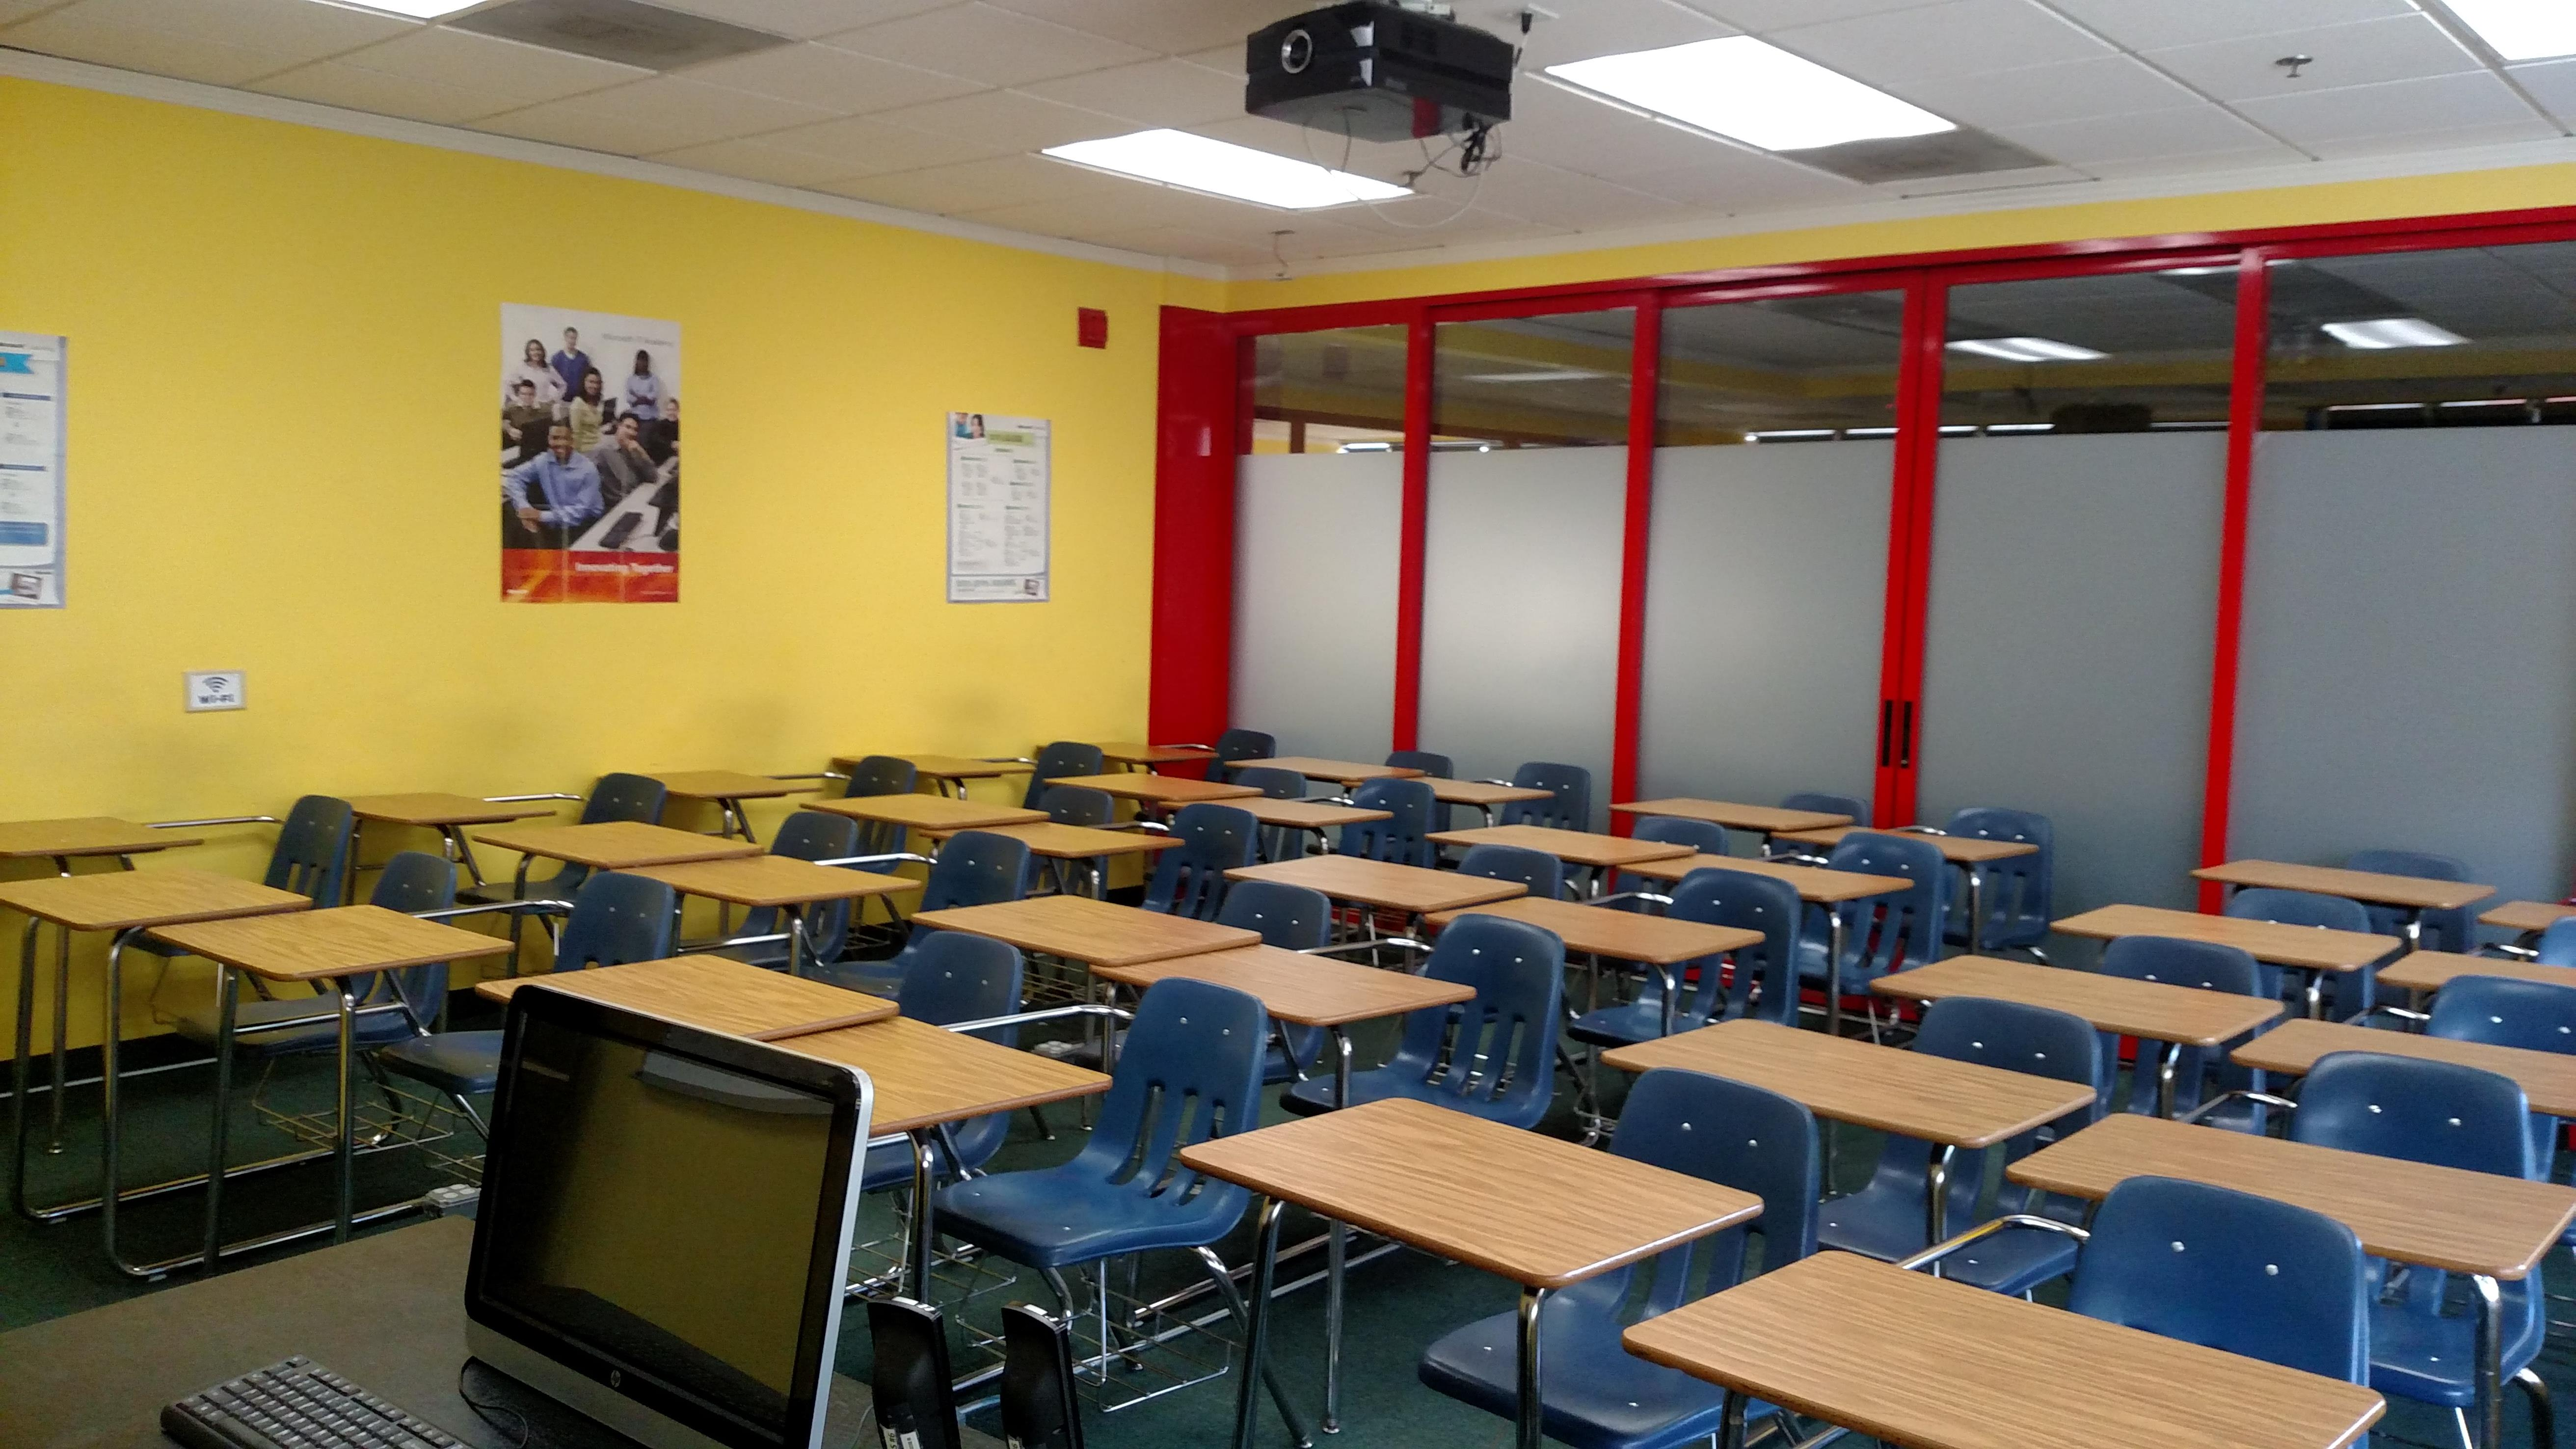 Learnet Academy, Inc. - Meeting Room 11